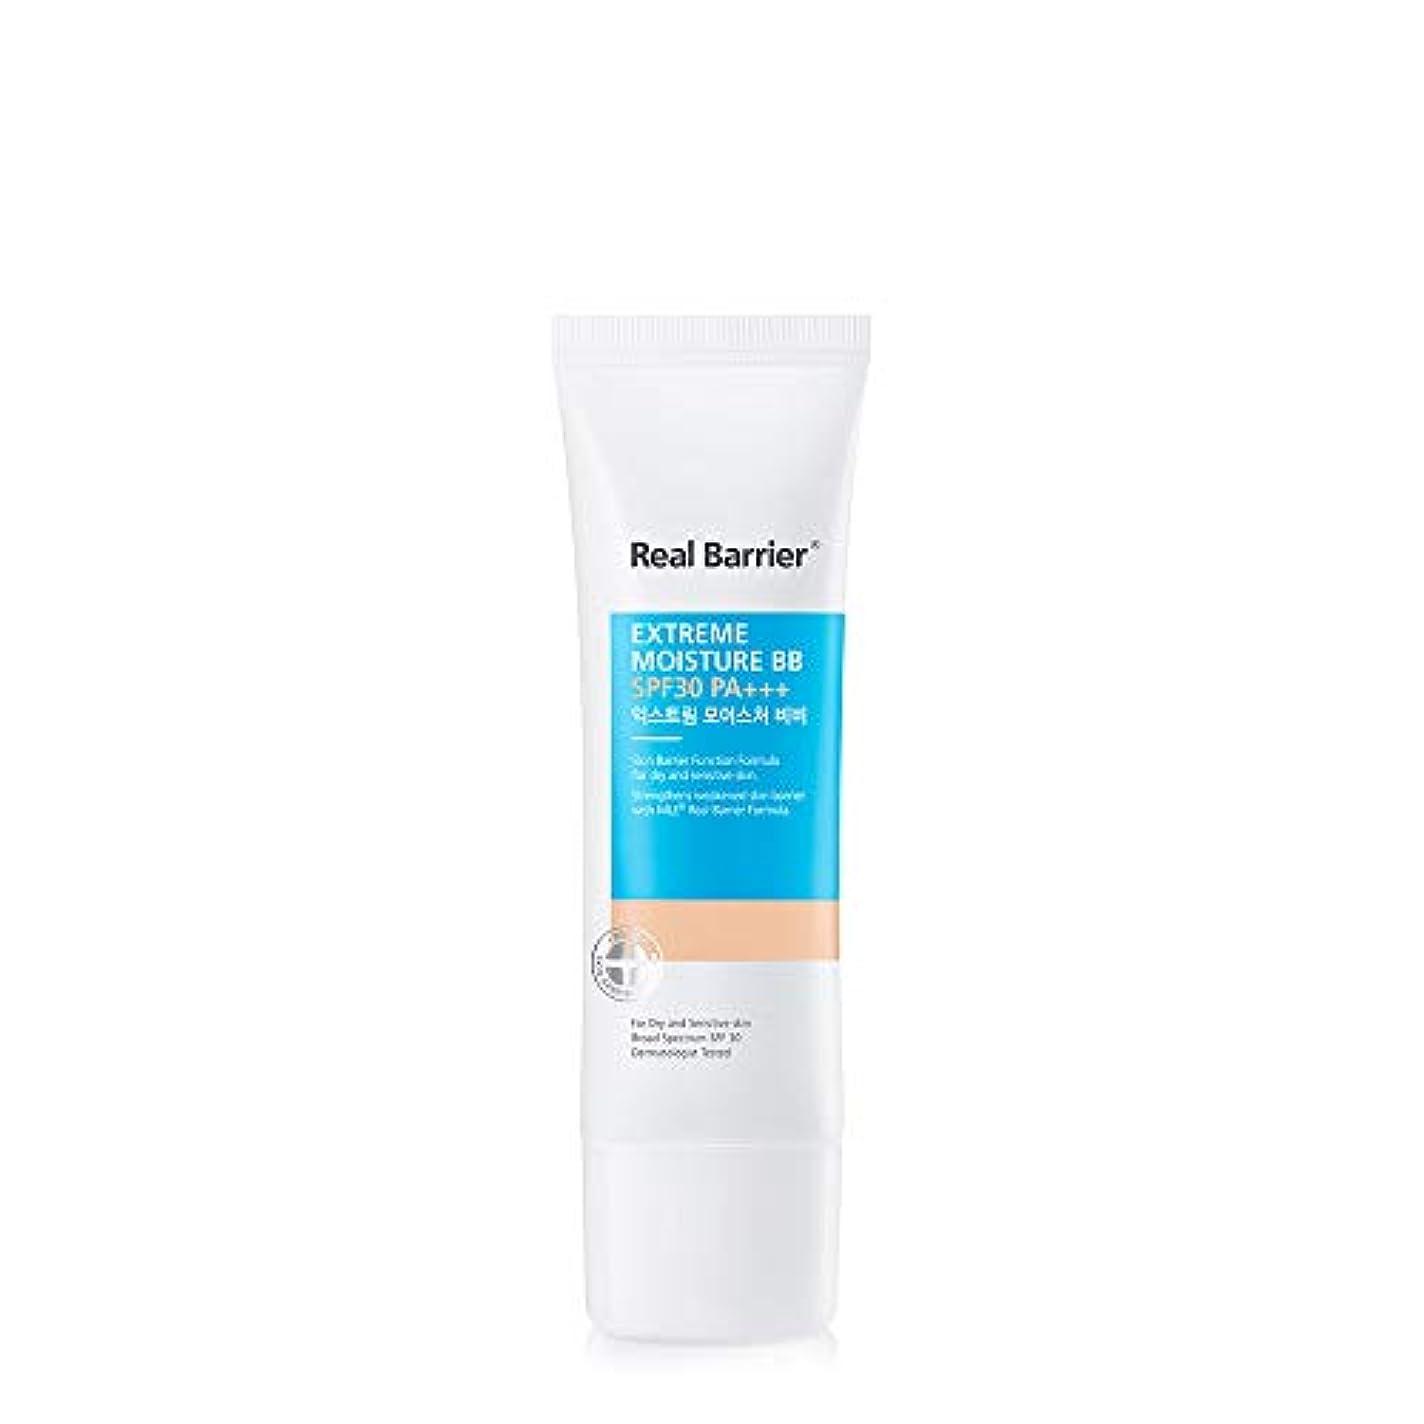 Neopharm リアルバリア エクス トリーム モイスチャー BB クリーム SPF30 PA+++ Real Barrier Extreme moisture BB Cream ATOPALM